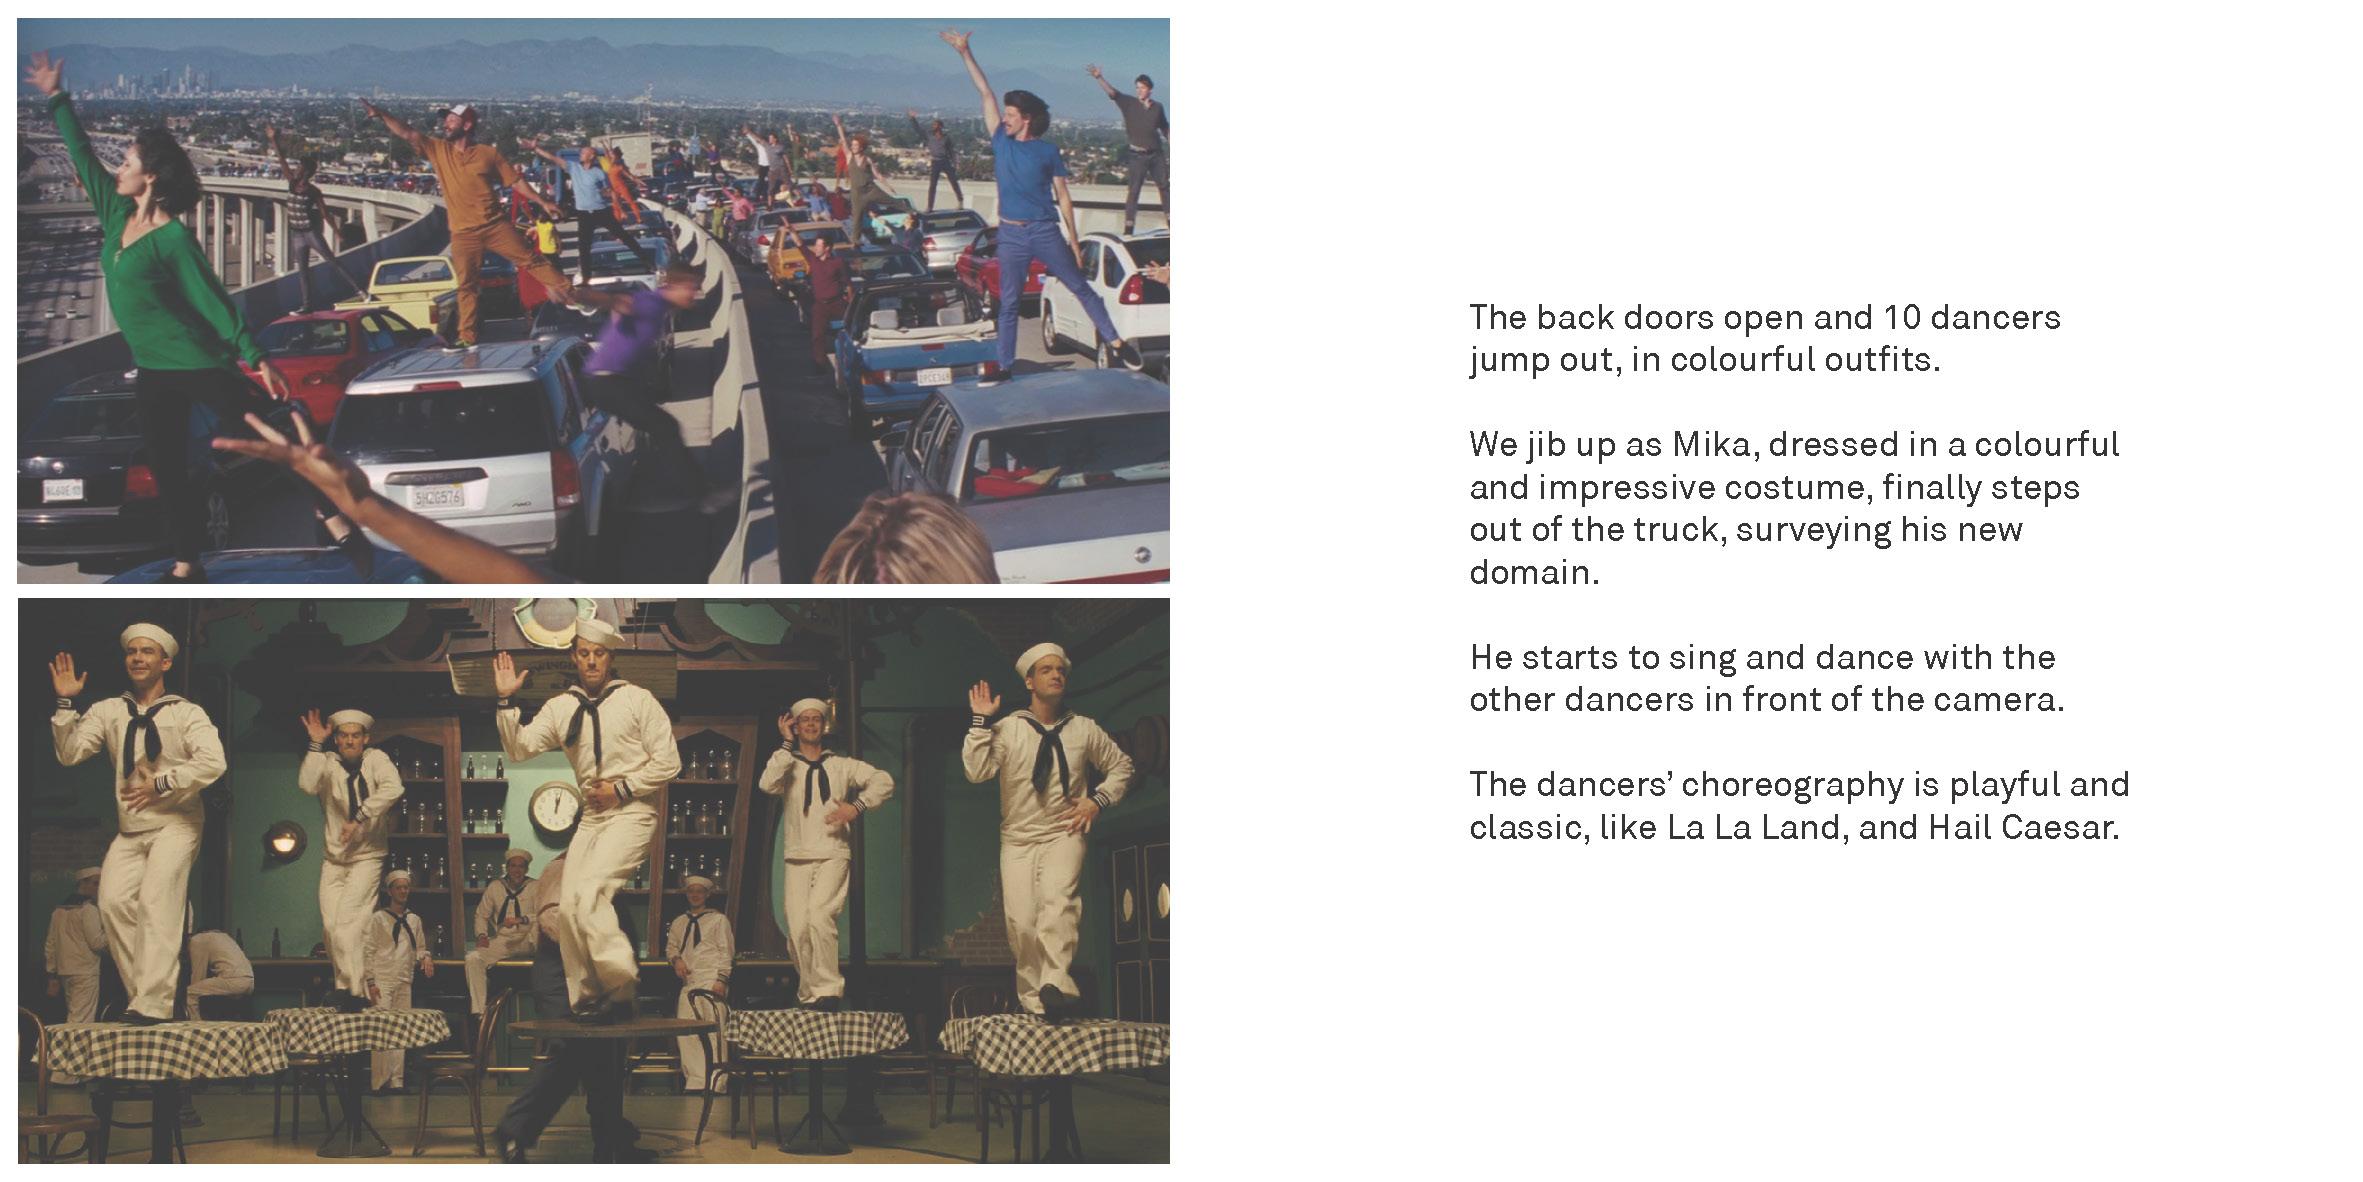 MIKA - ICE CREAM v6_Page_08.jpg